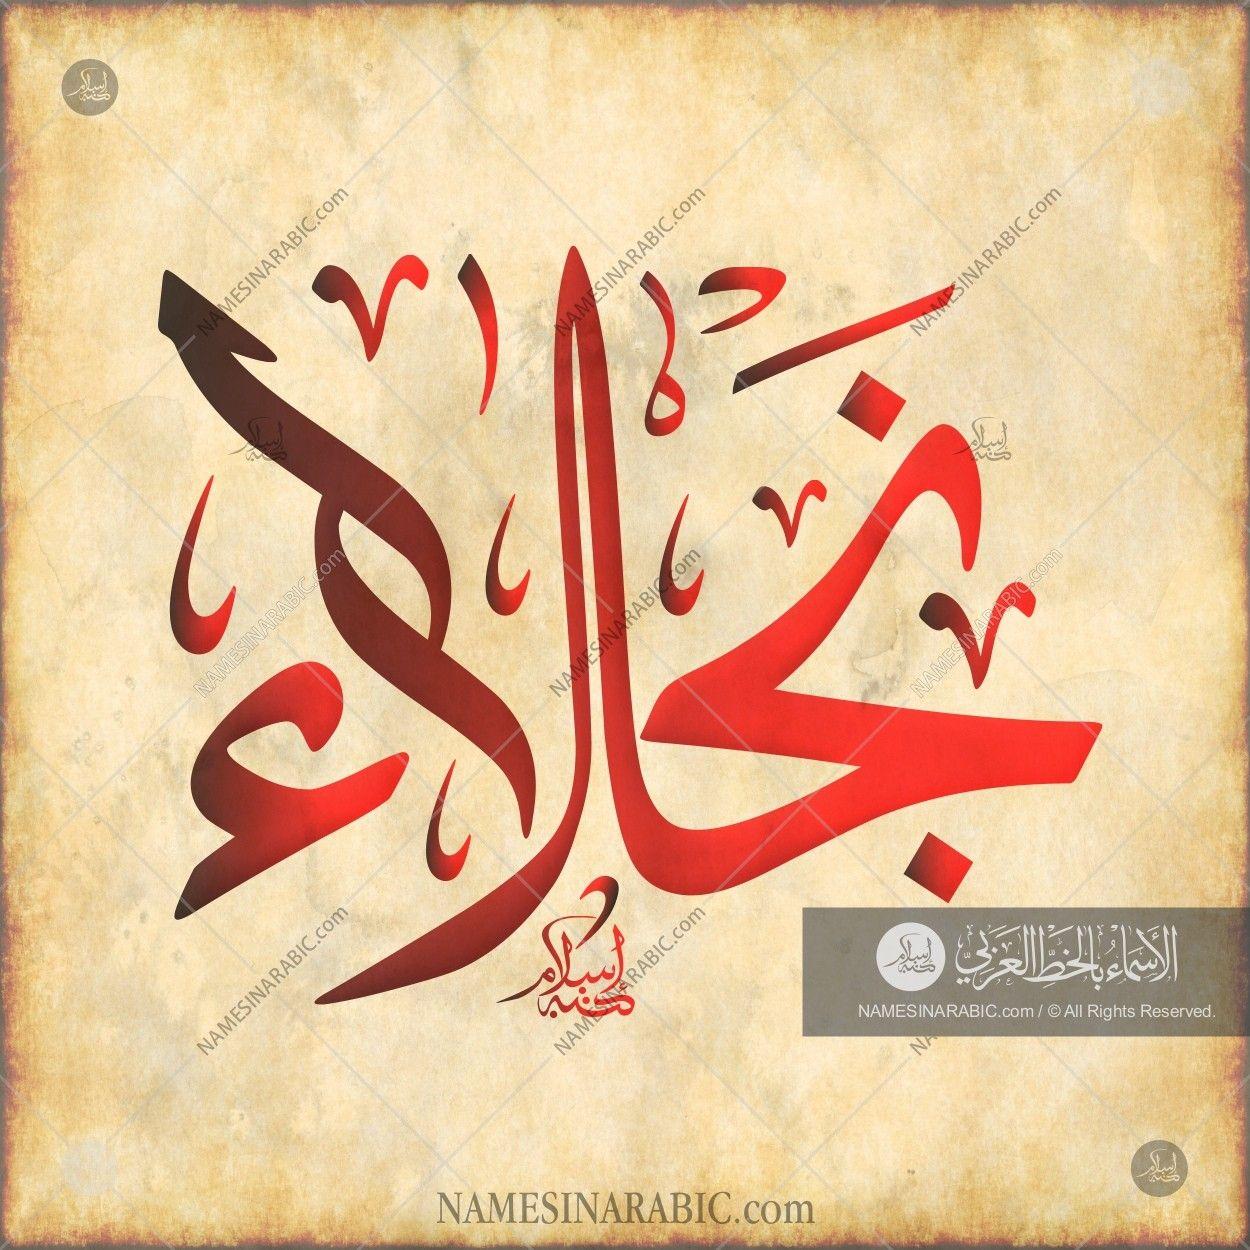 Najla نجلاء Names In Arabic Calligraphy Name 1781 Arabic Calligraphy Design Calligraphy Art Calligraphy Design